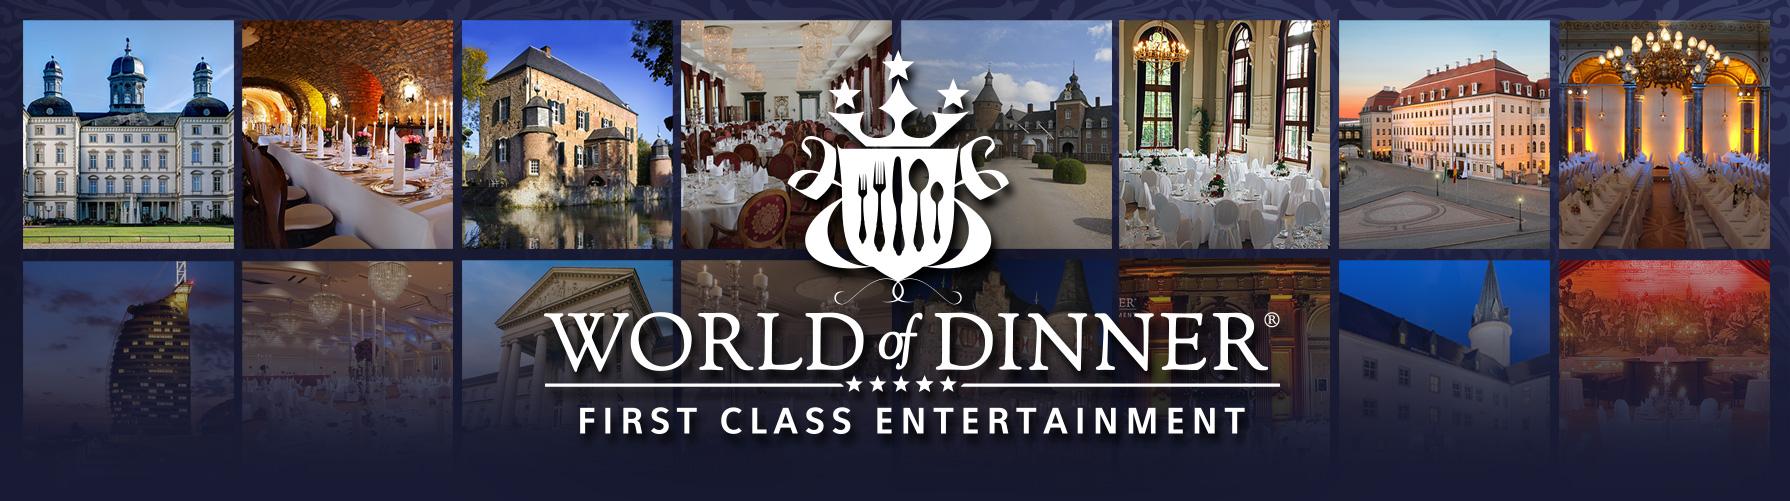 WORLD of DINNER - Alle Spielorte - WORLD of DINNER